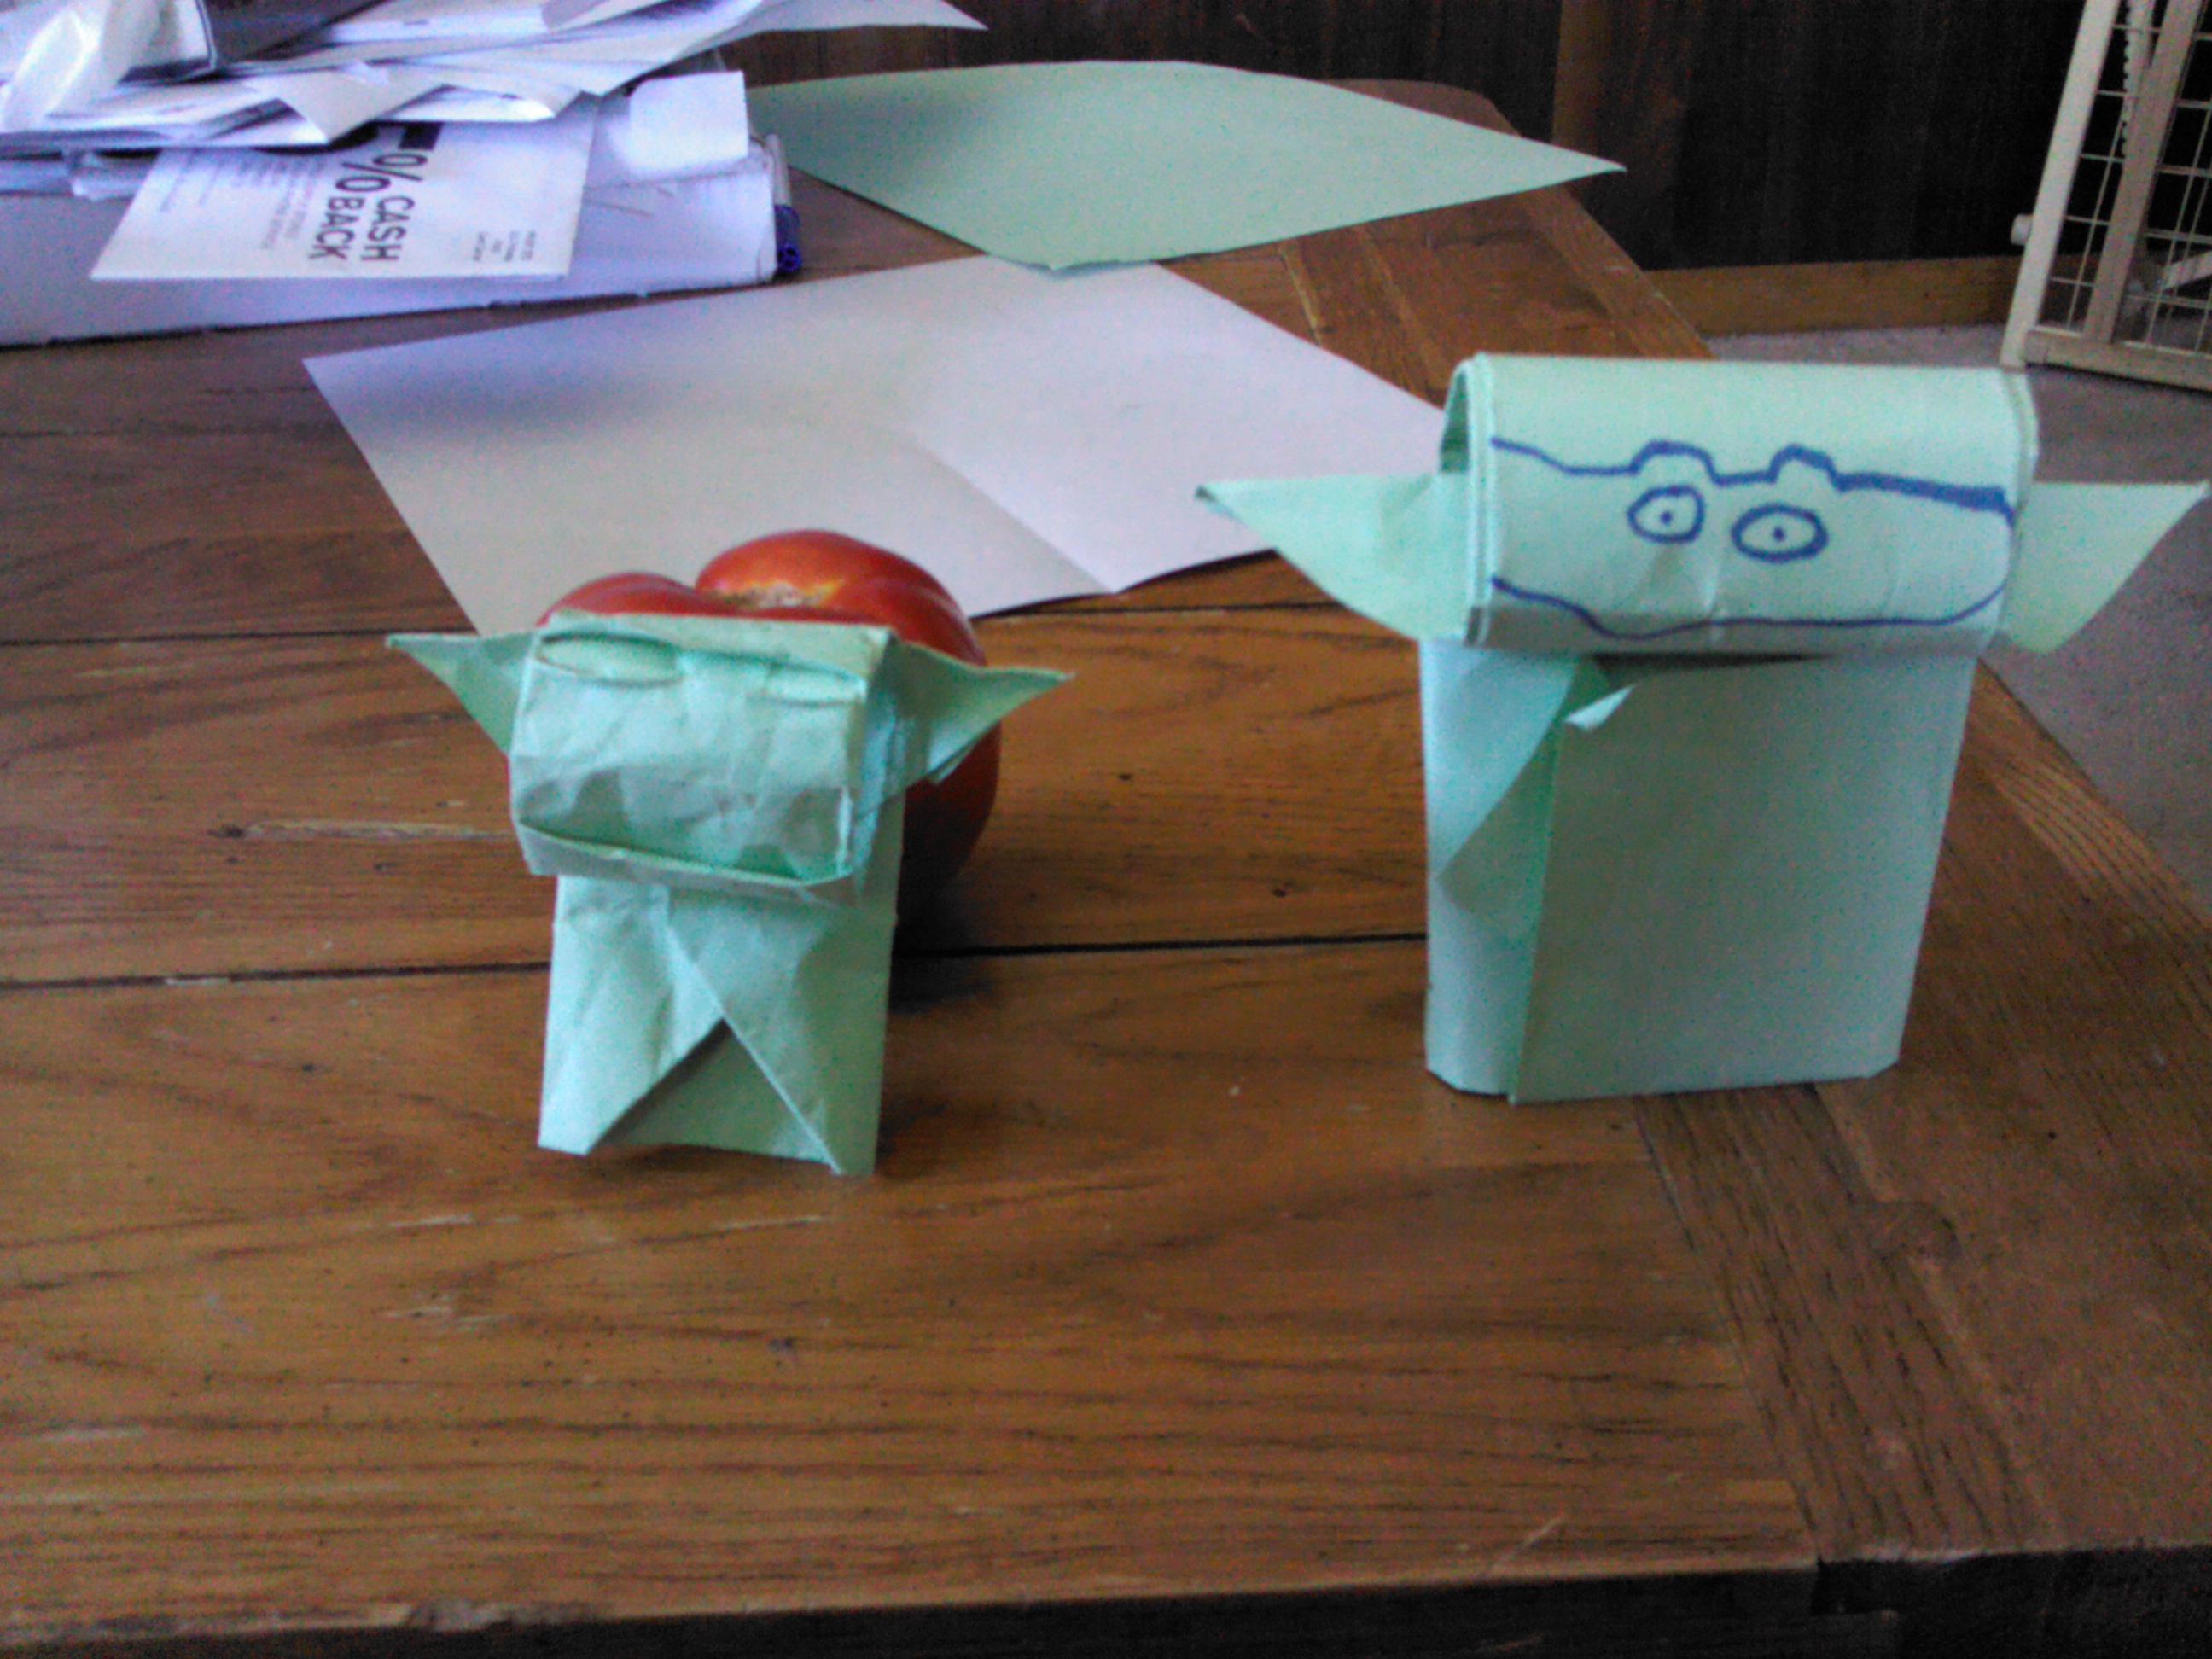 At last… the Van Jahnke Yoda! | OrigamiYoda - photo#13